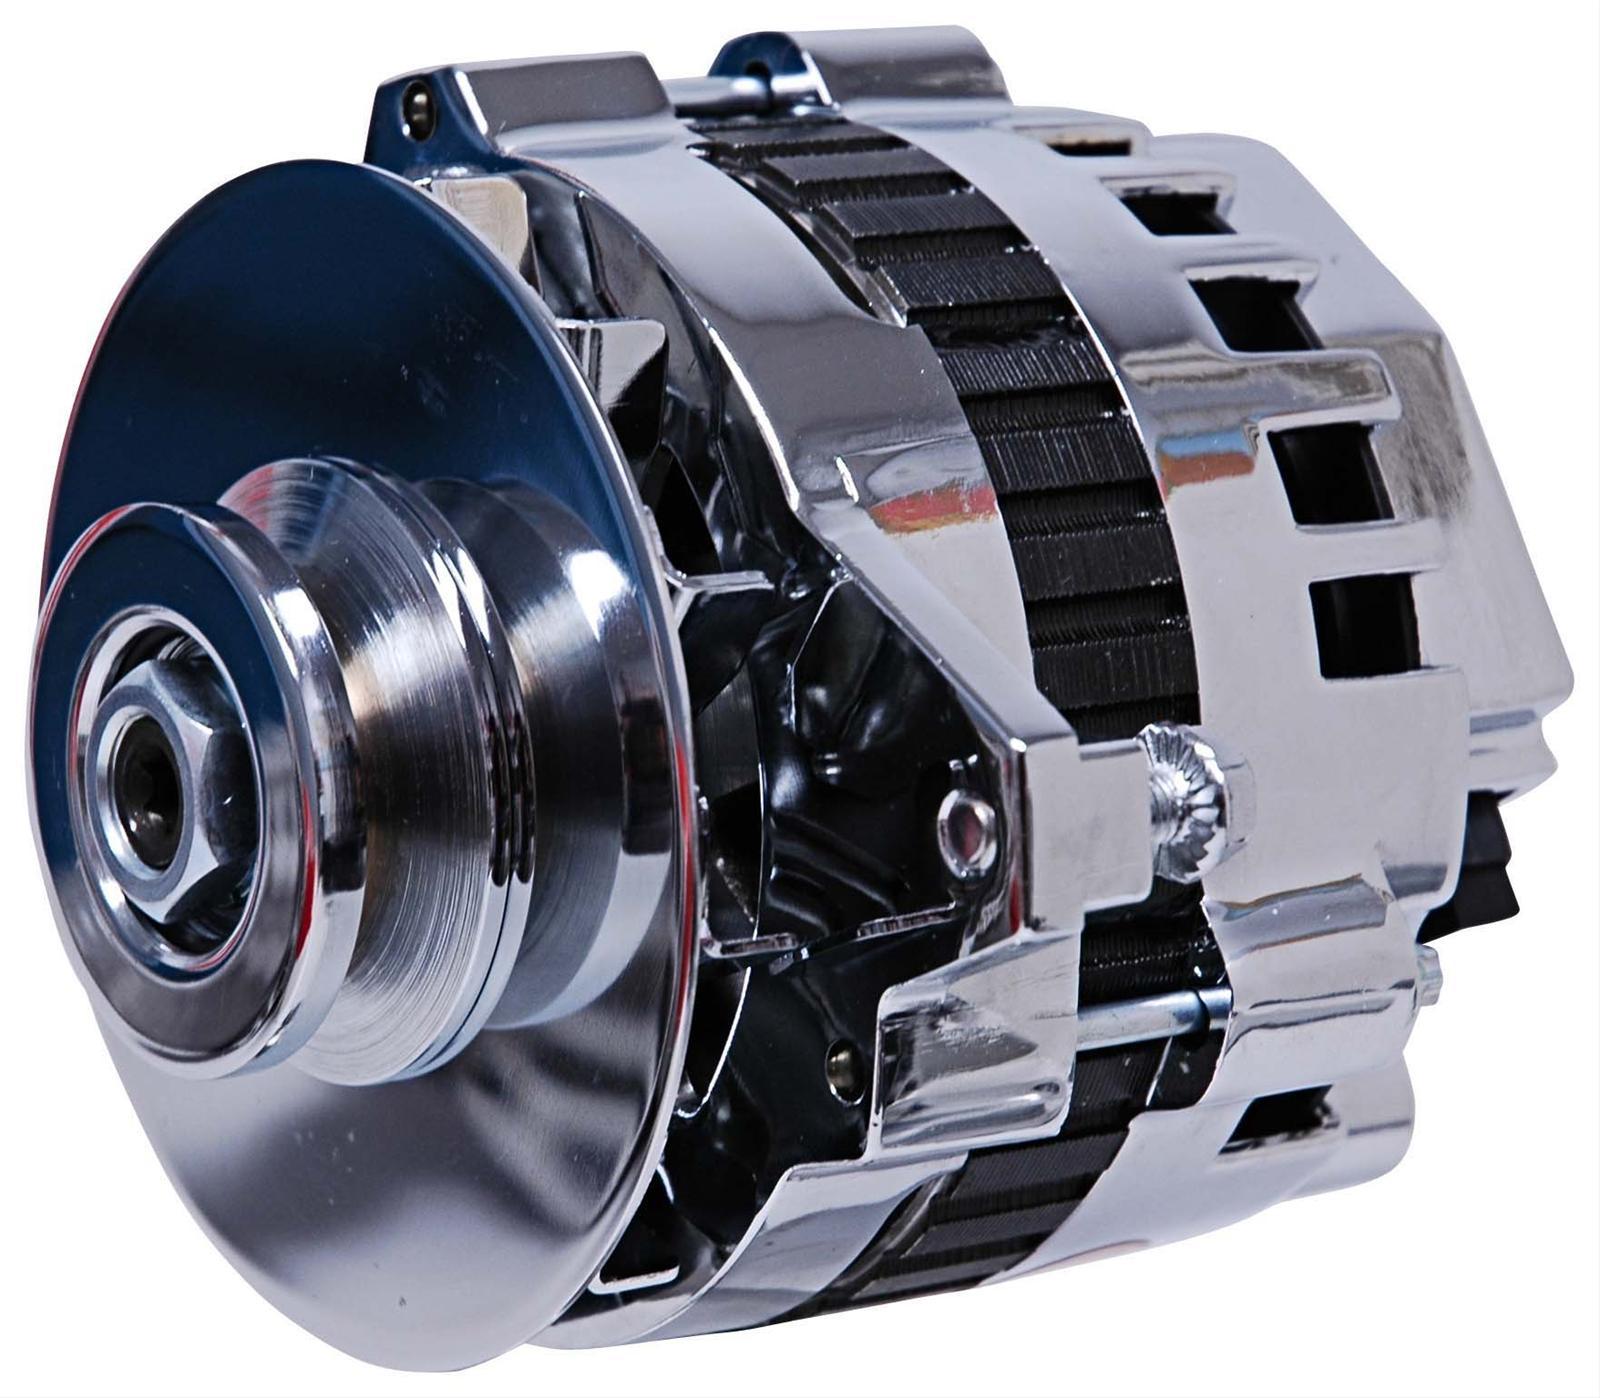 Msd Dynaforce Alternators 5362 Free Shipping On Orders Over 49 At Gm Amp Gauge Alternator Wiring Summit Racing